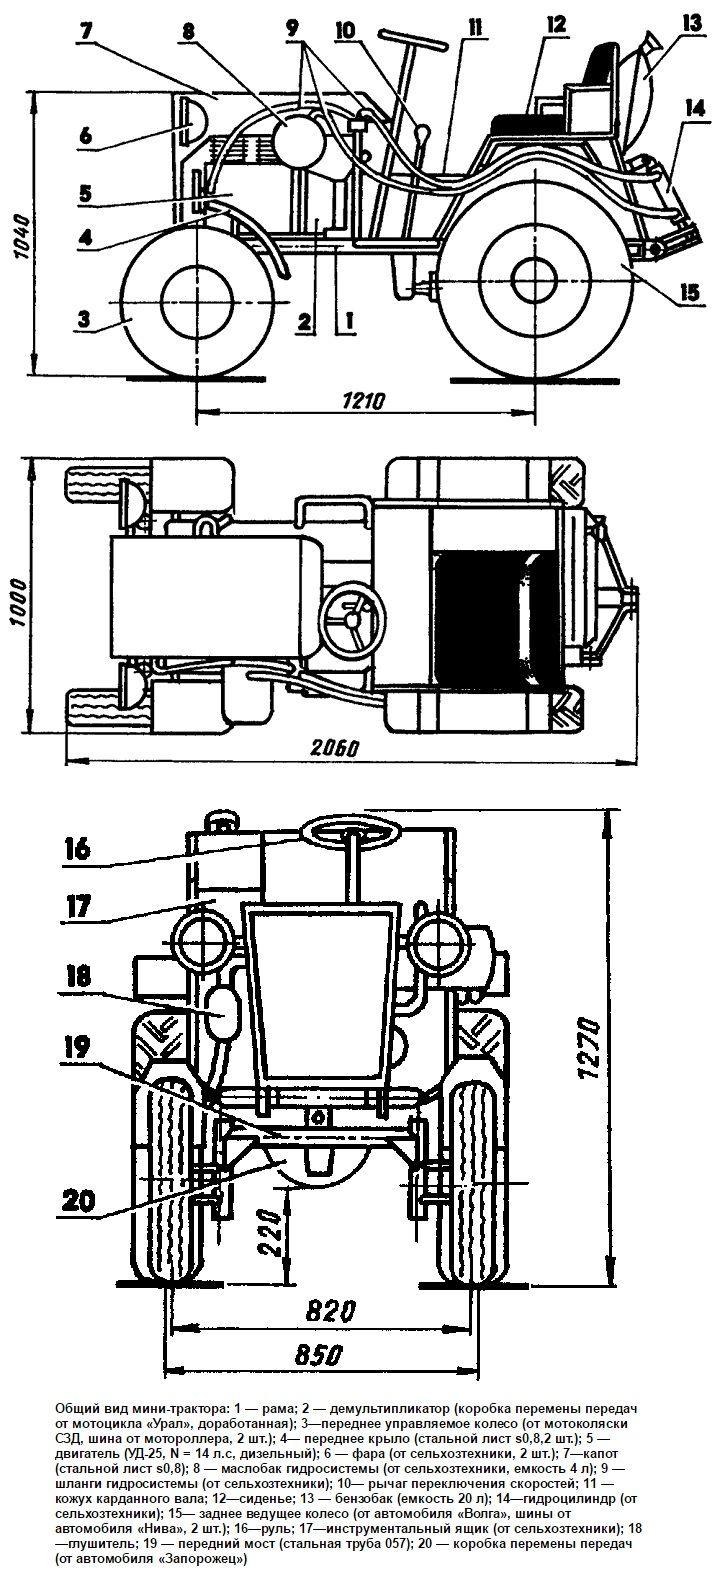 Трактор своими руками в домашних условиях фото и чертежи фото 102